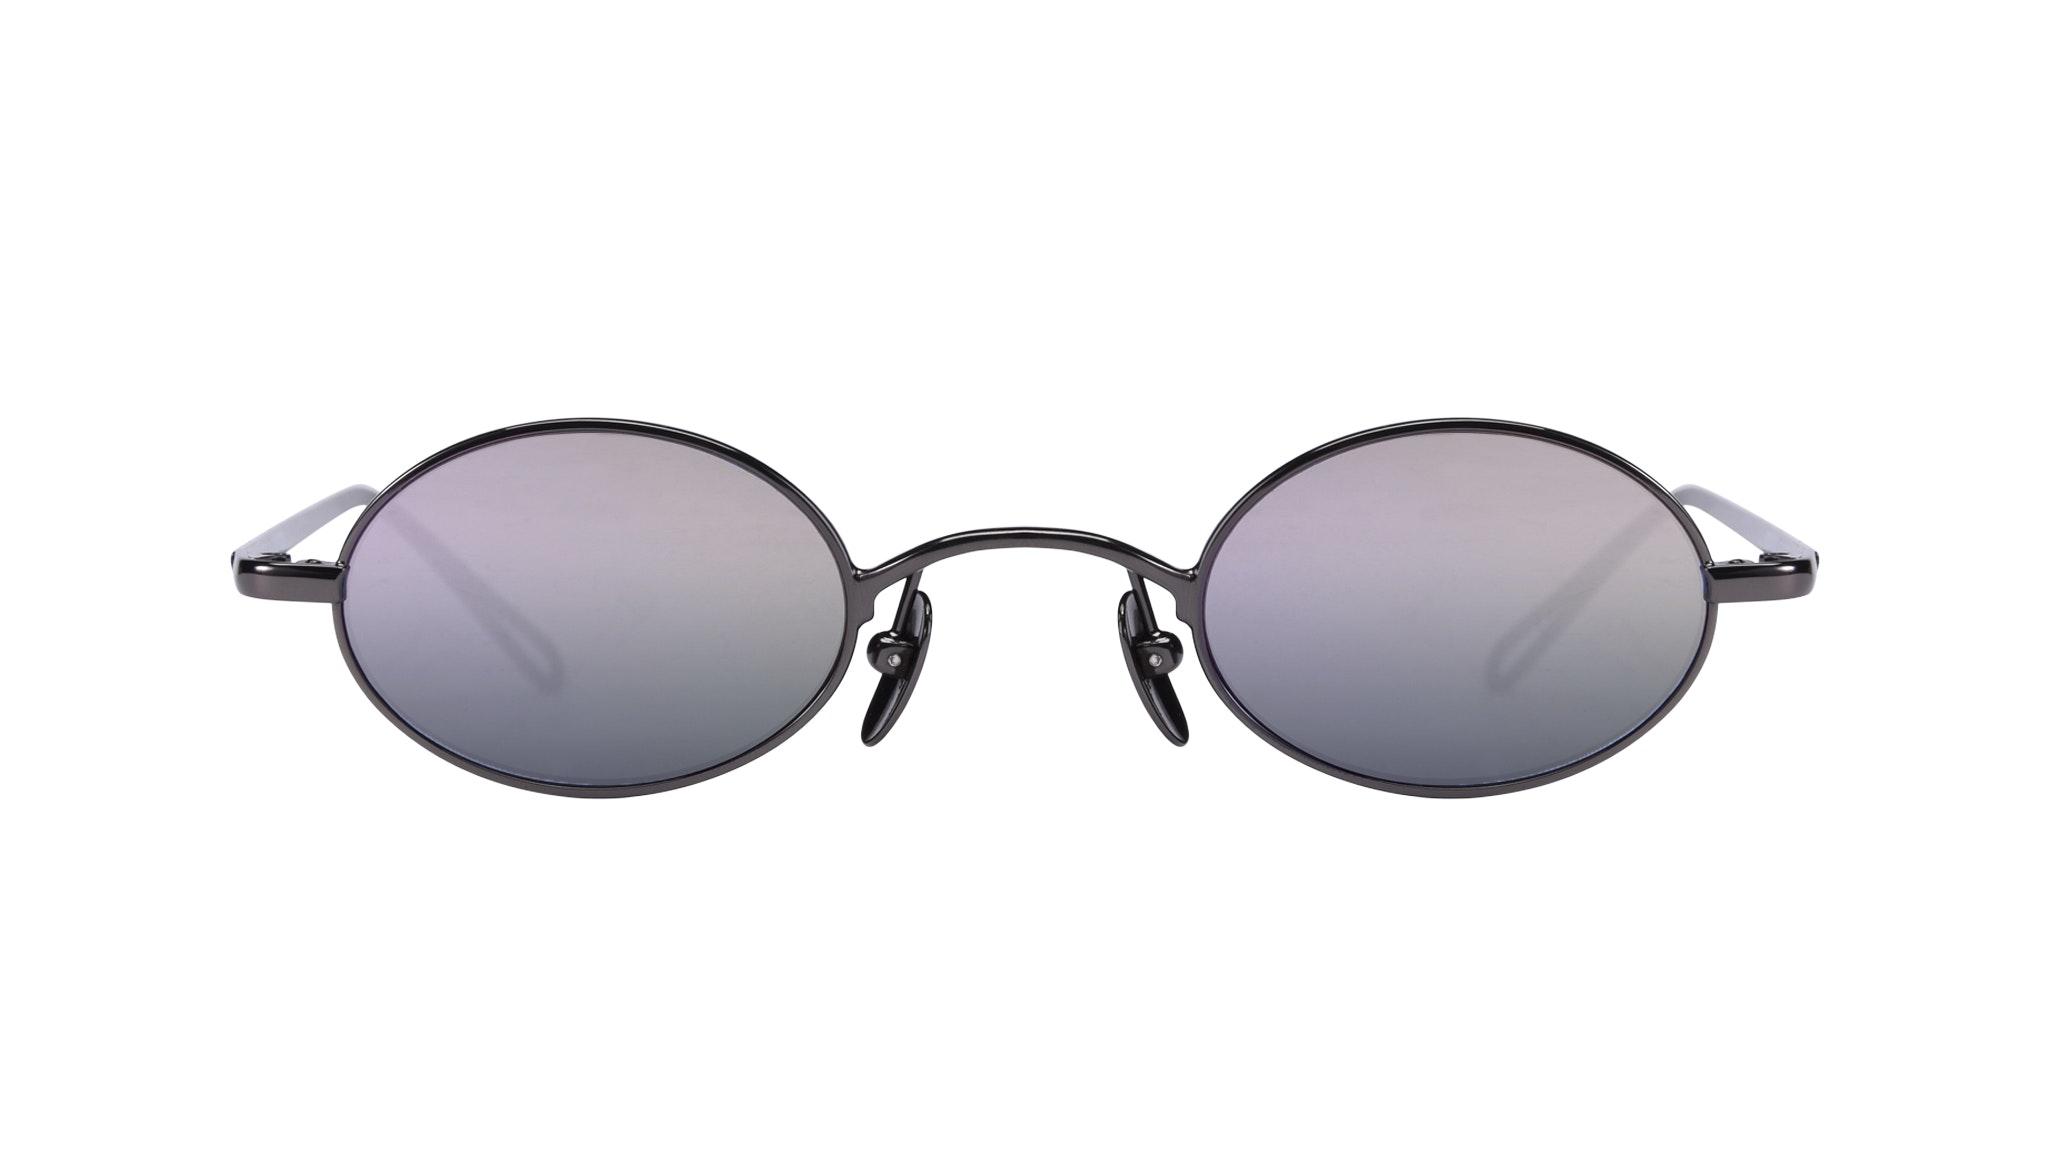 Affordable Fashion Glasses Round Sunglasses Women Stellar Shadow